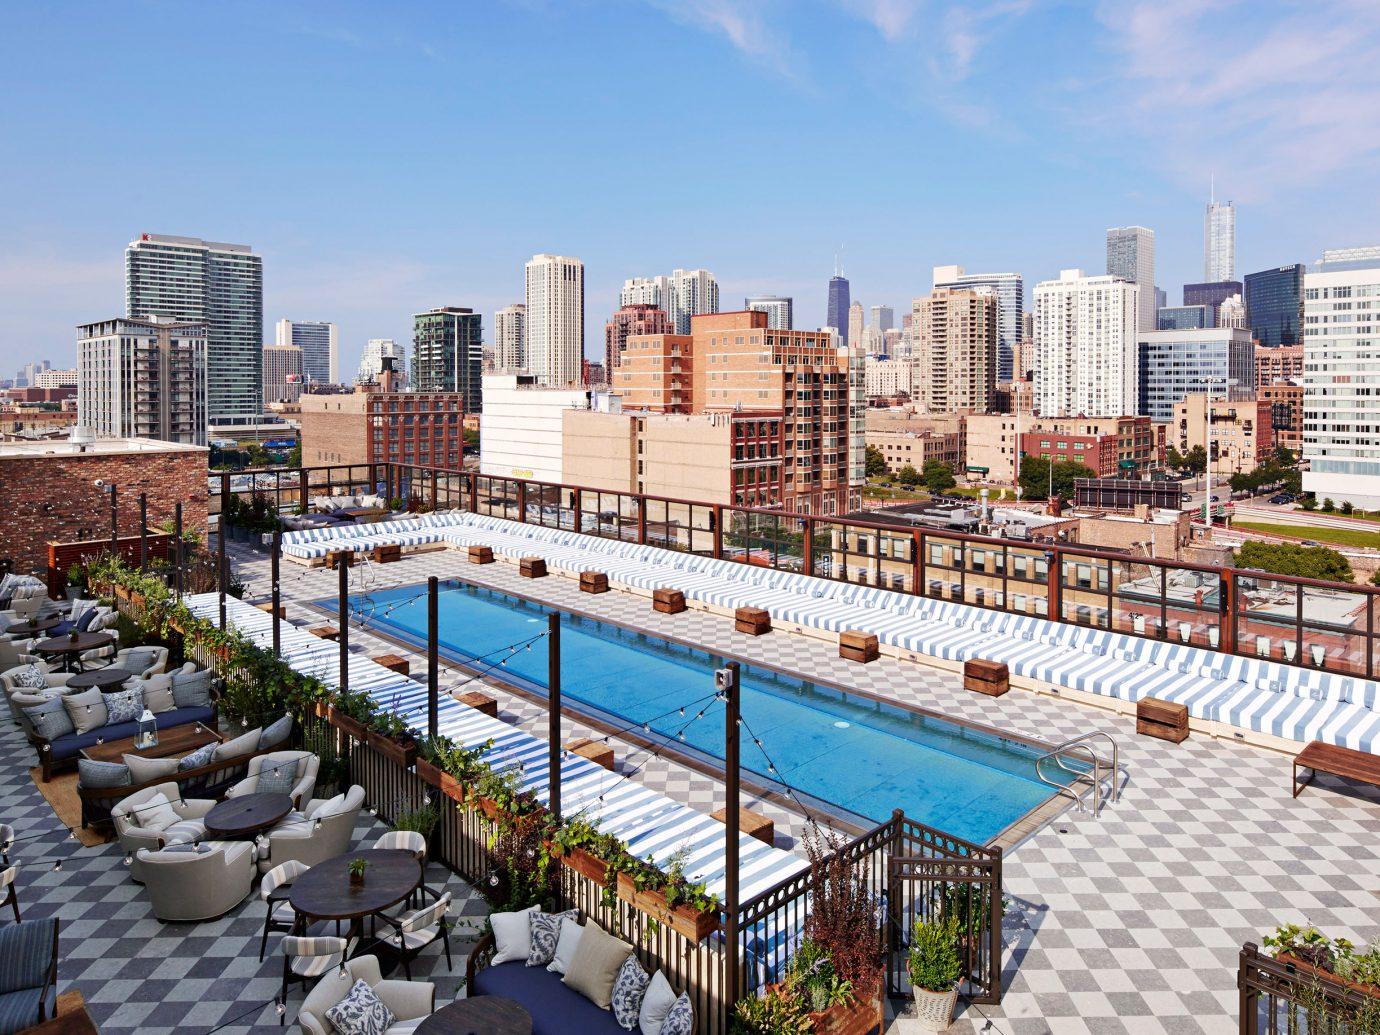 Pool at Soho House Chicago